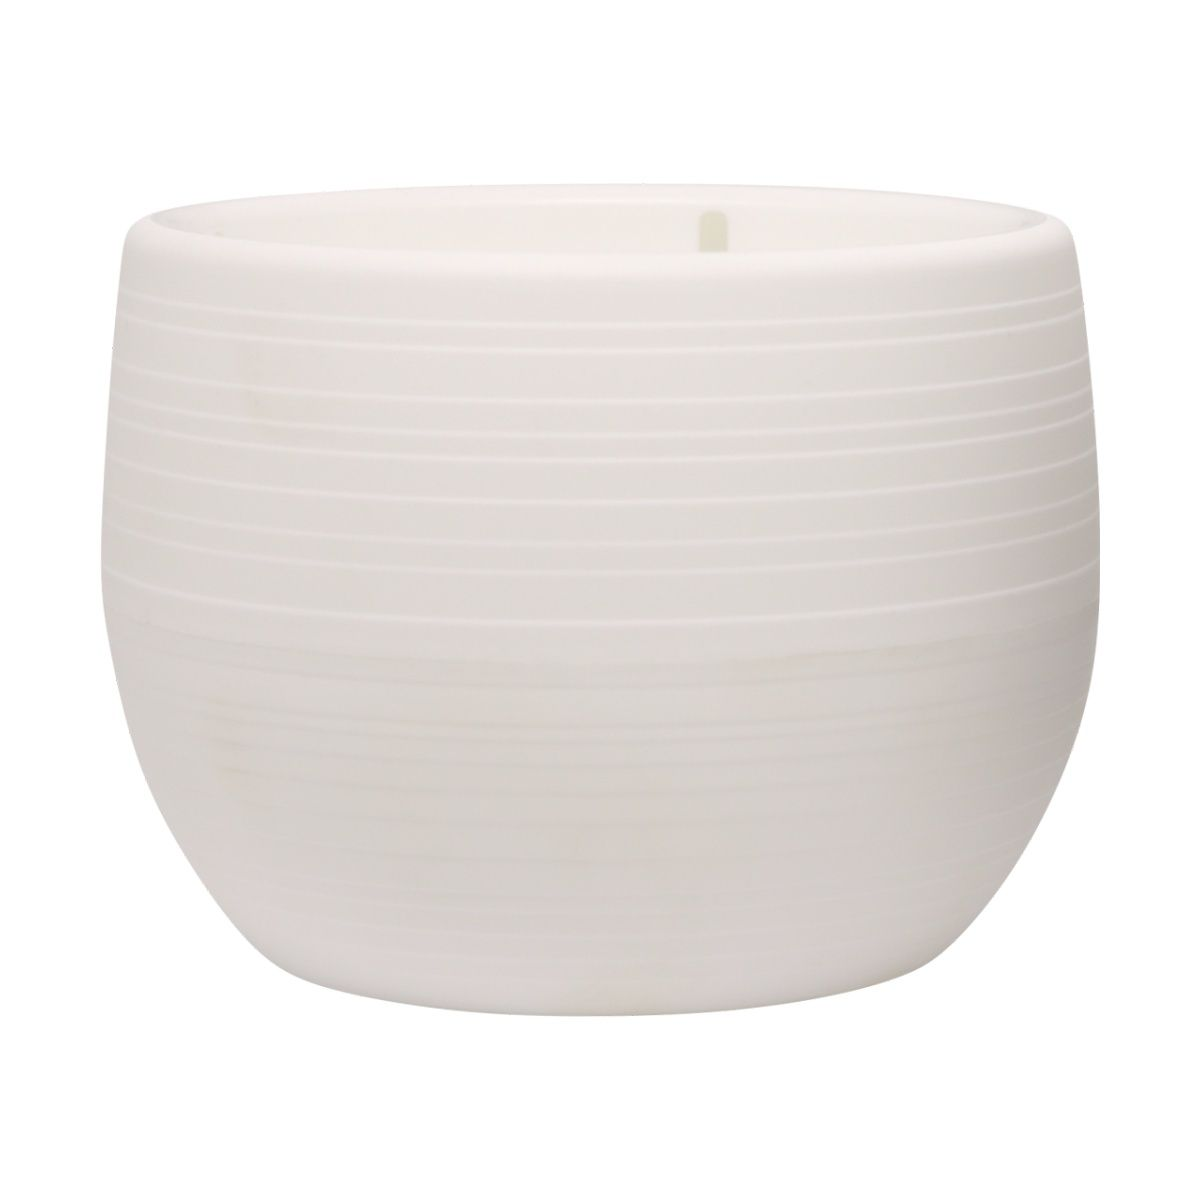 Vaso Bigball Branco 10cm x 12cm - VBG2